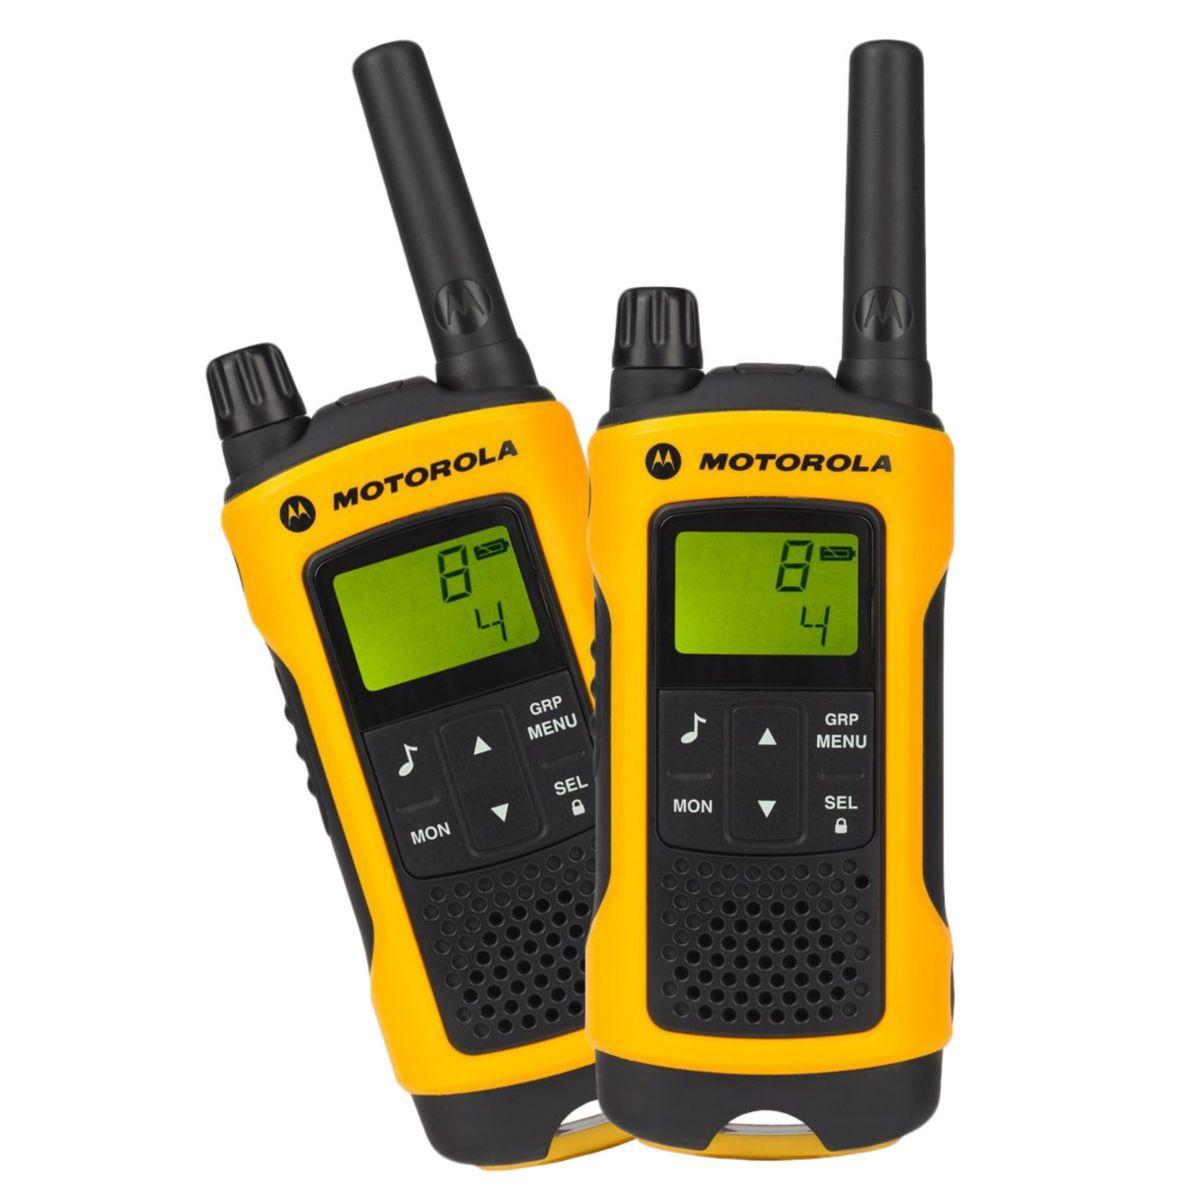 Talkie walkie MOTOROLA T80 Extreme Twin Jaune (photo)